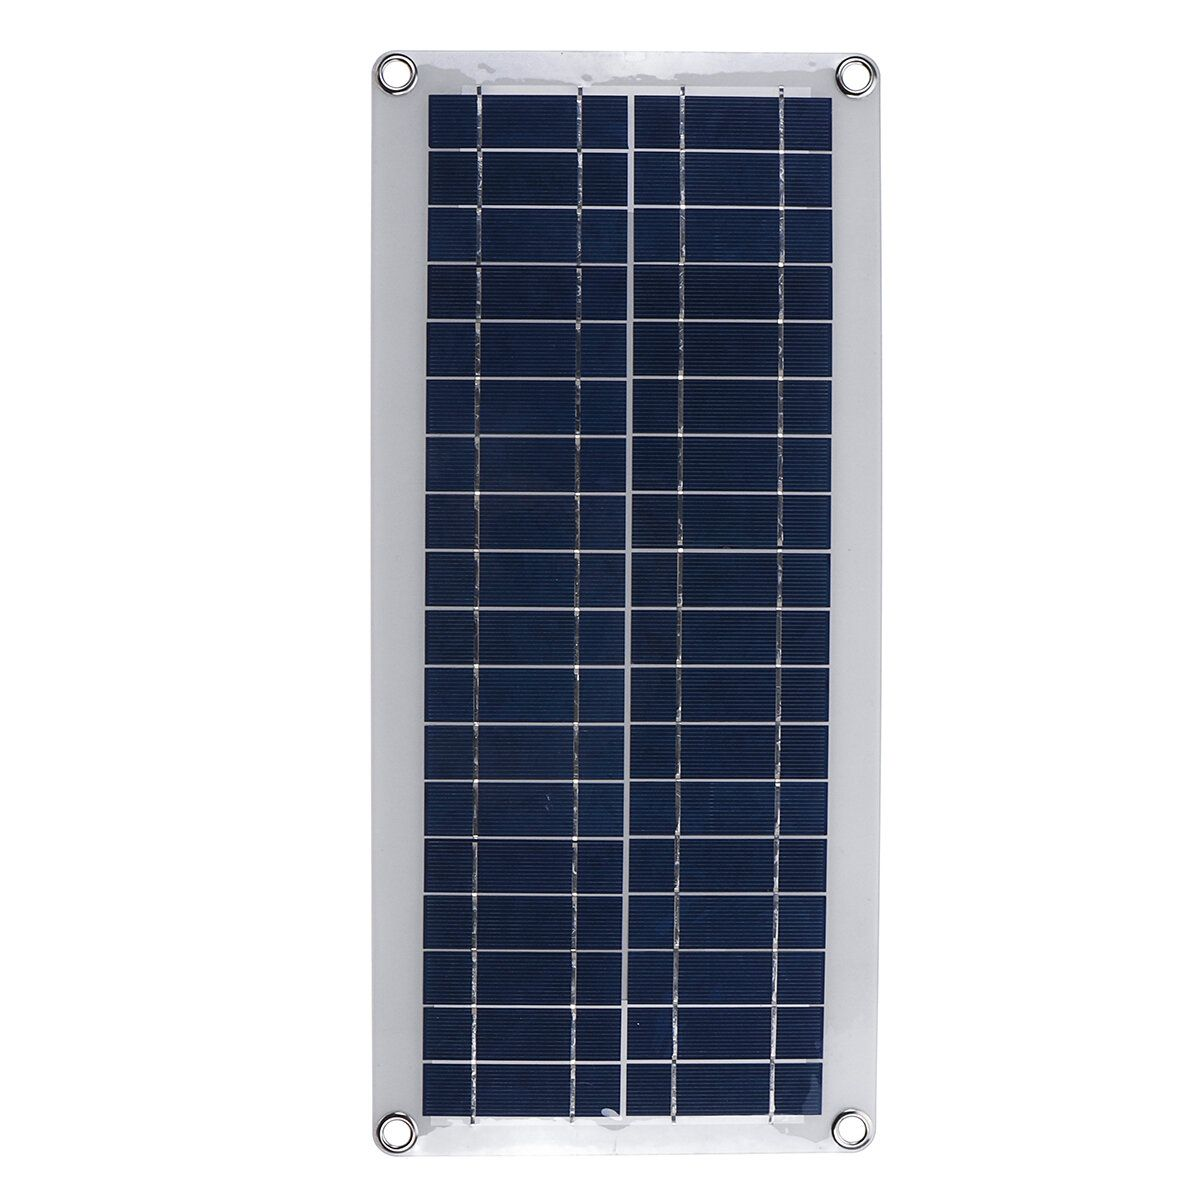 DC 12V/18V Solar Panel Double 5V USB Port Charging Battery Charger For Camping Traveling